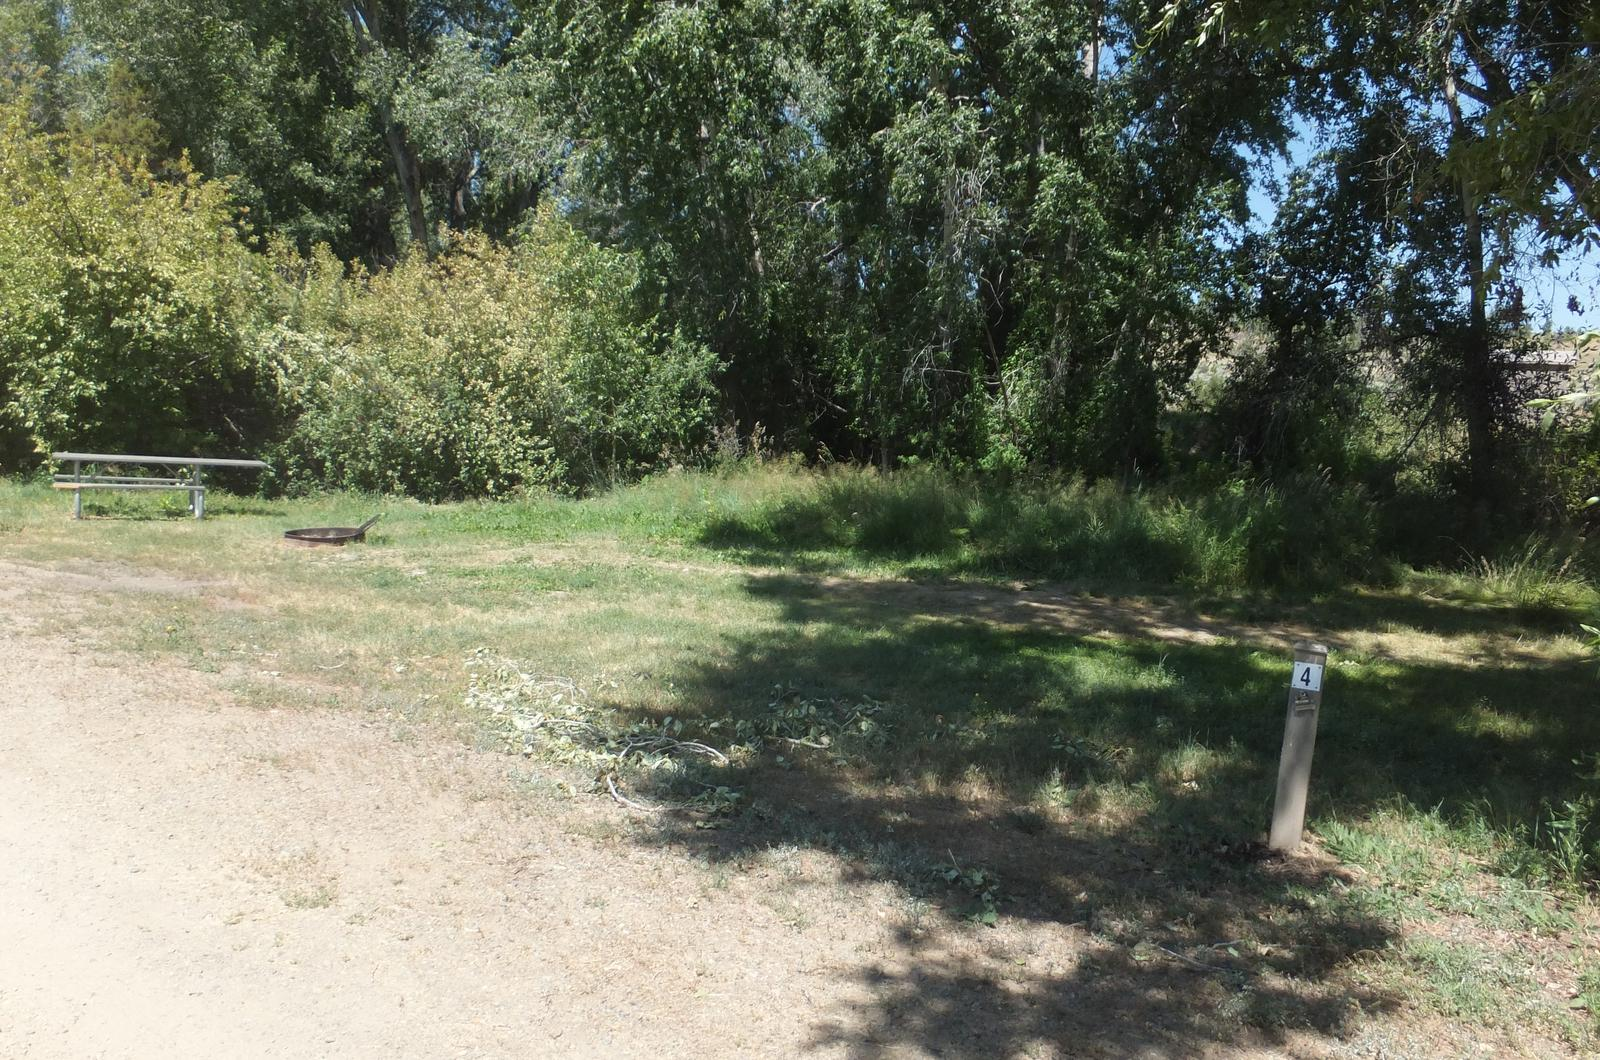 Hellgate Campground - Campsite 4